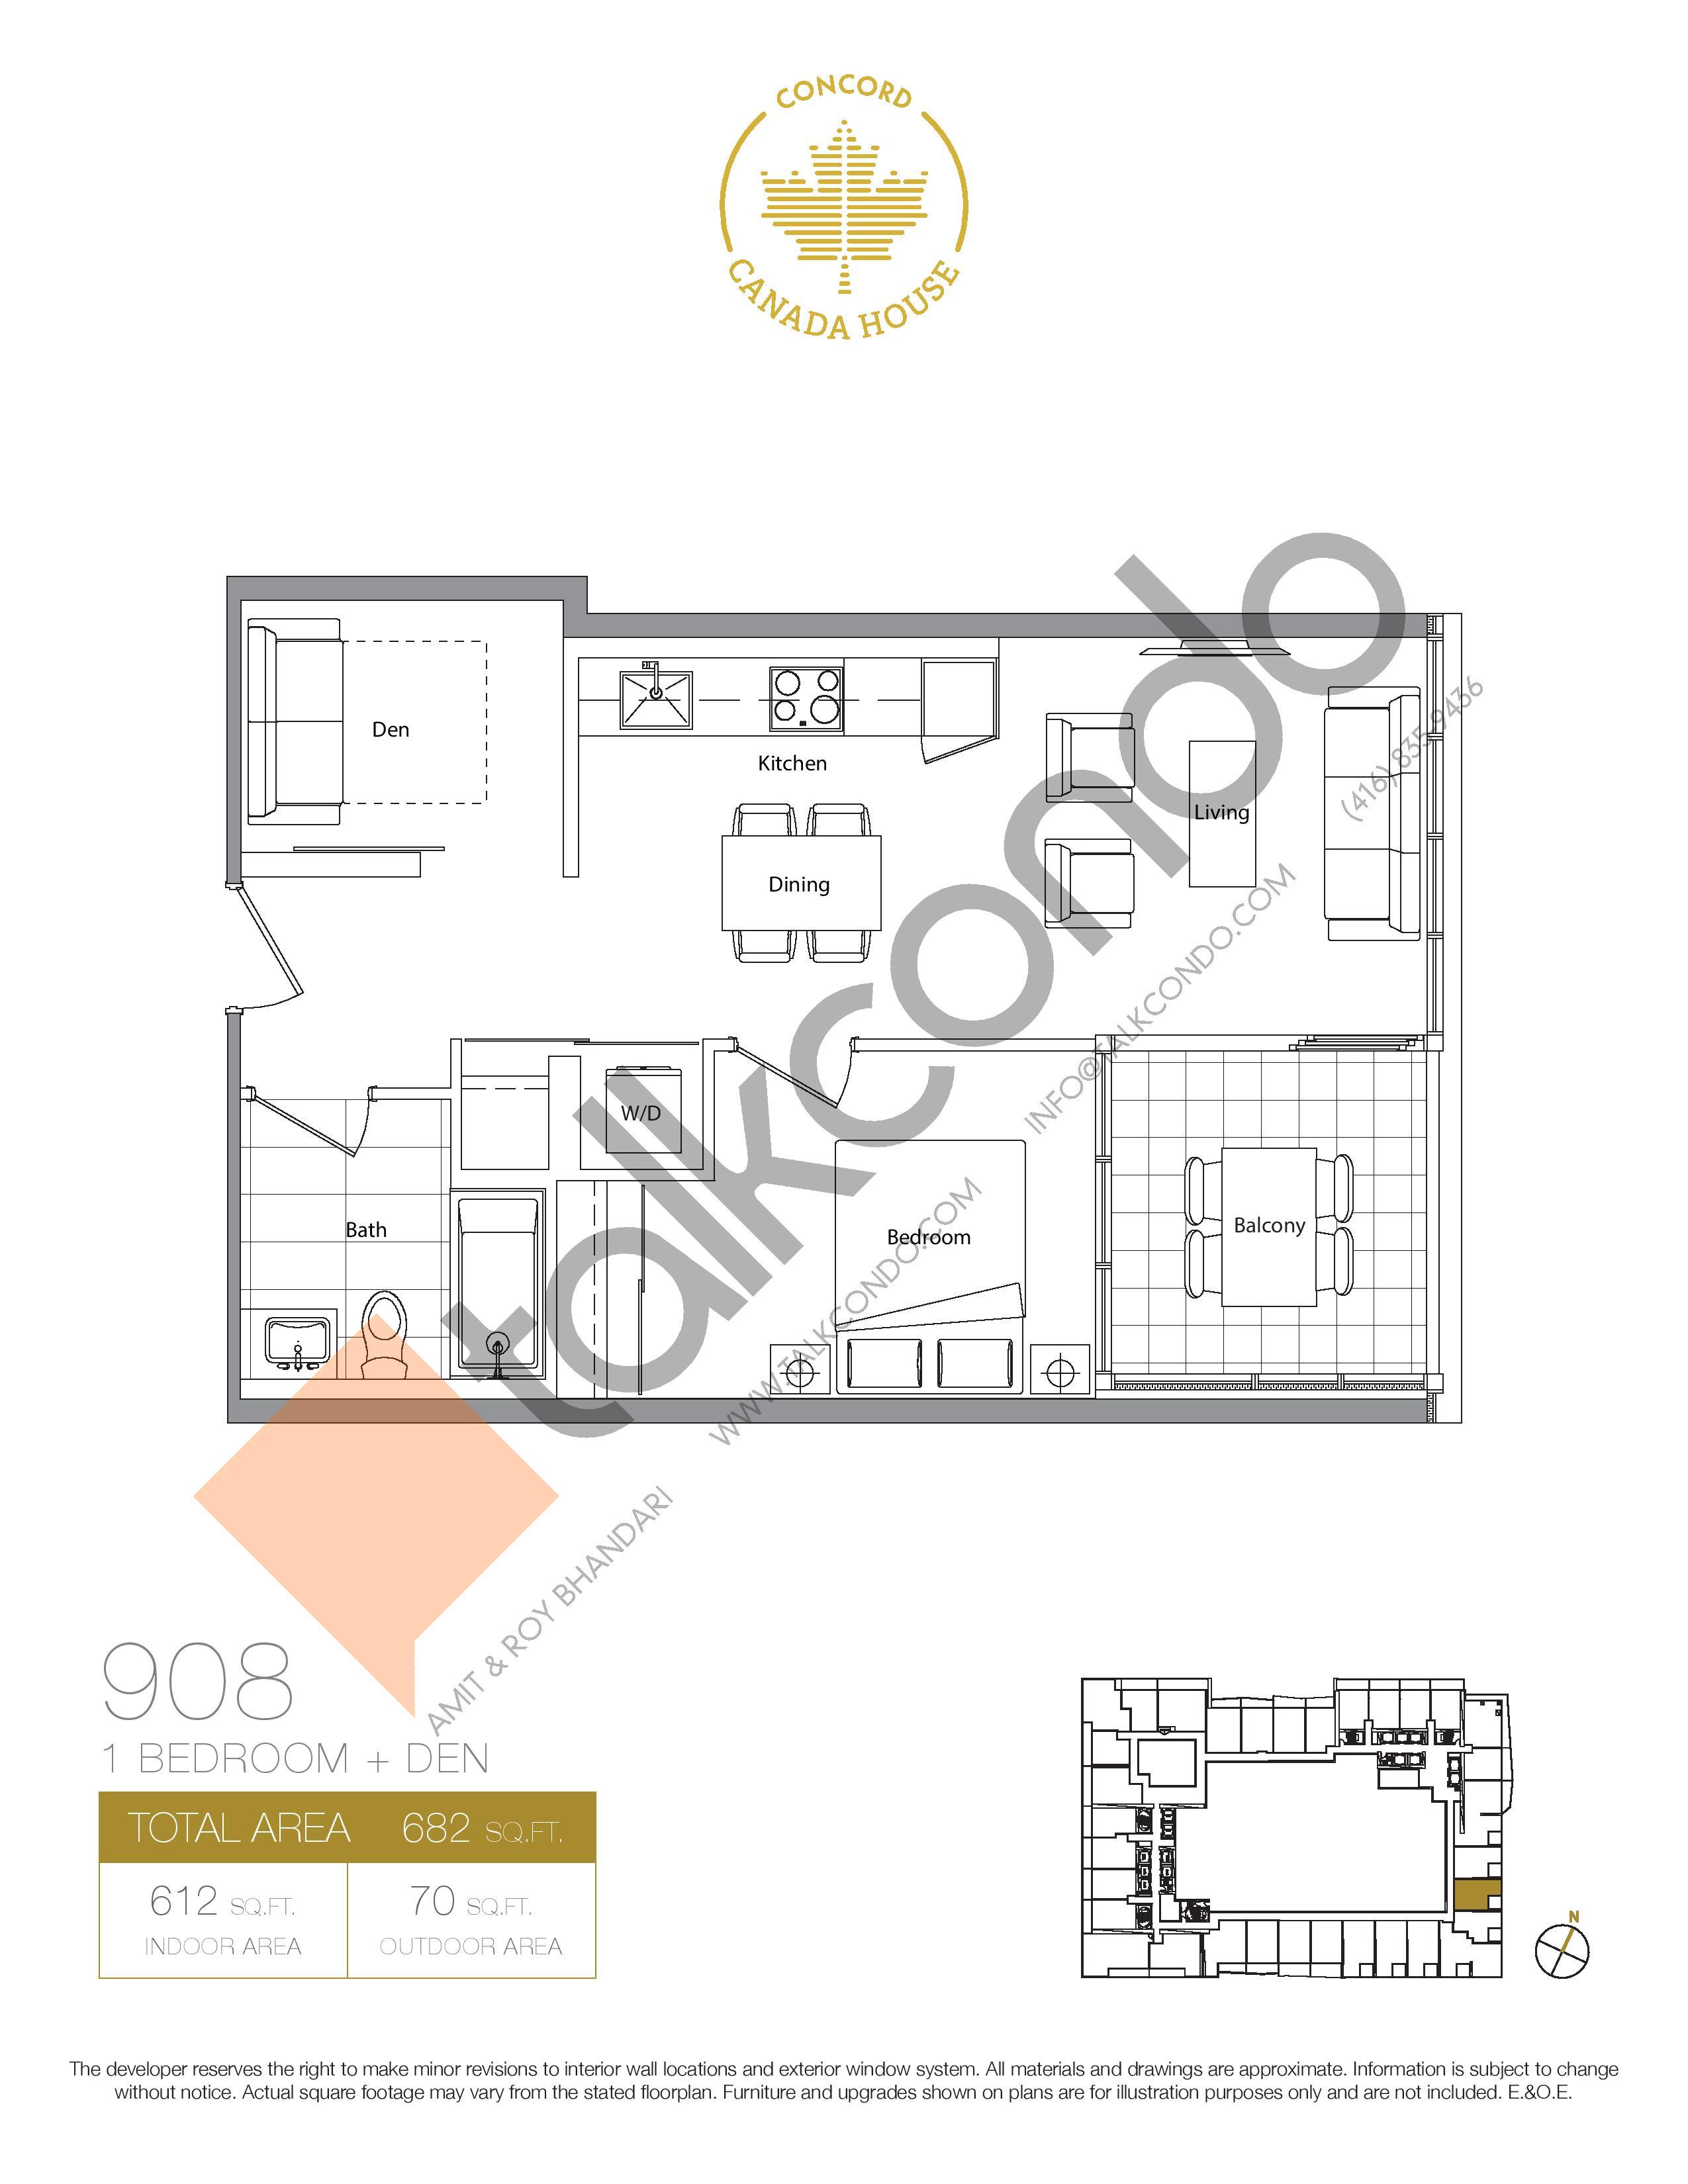 908 (Podium) Floor Plan at Concord Canada House Condos - 612 sq.ft